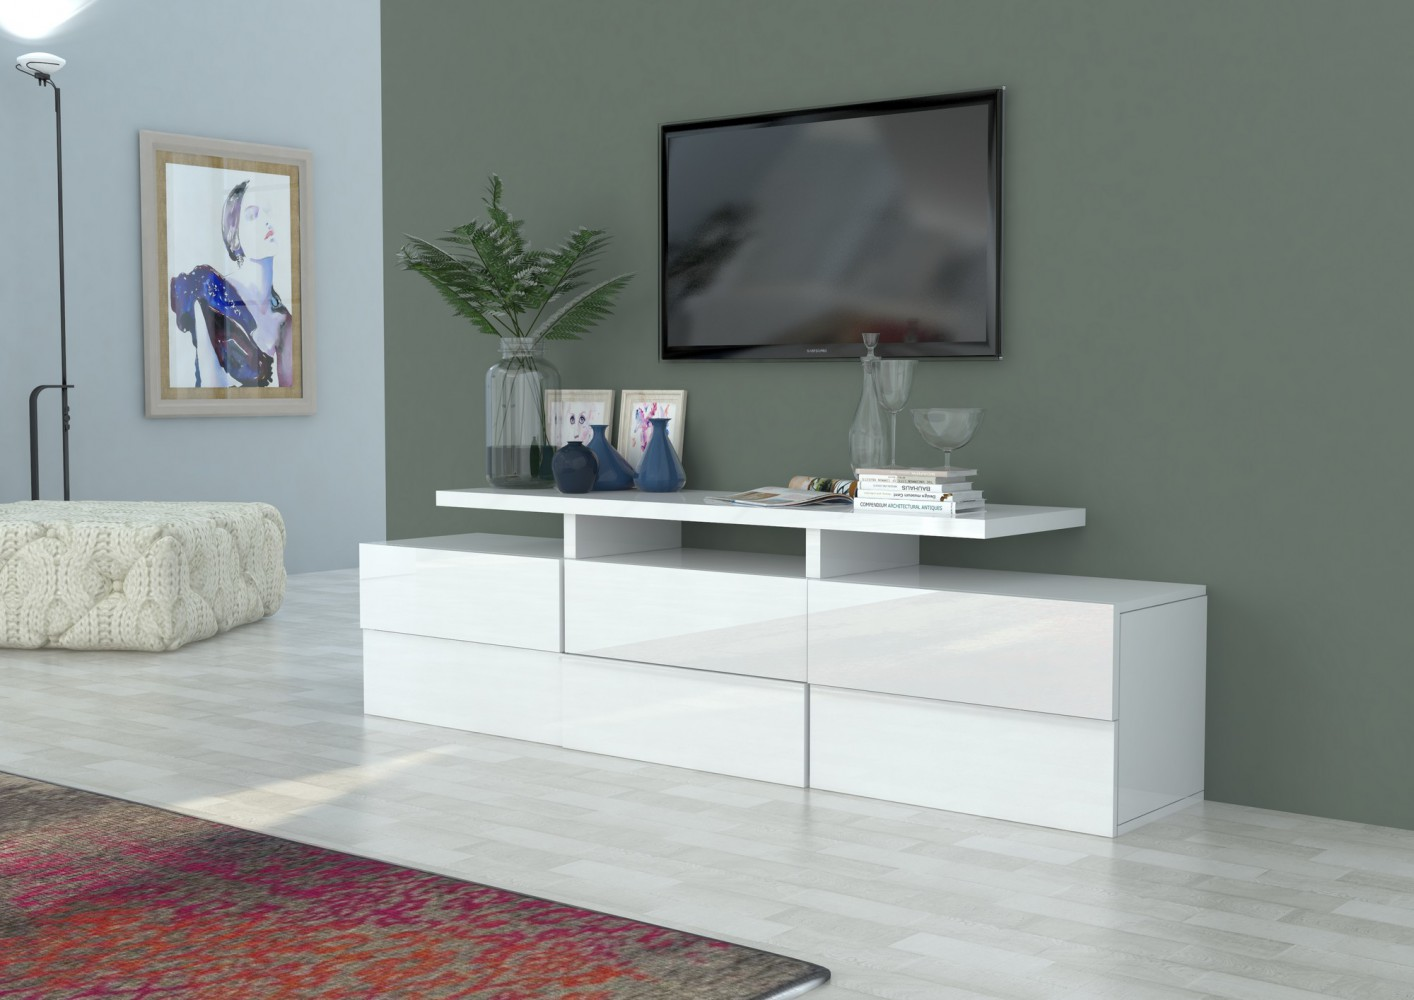 Cool Wohnwand 200 Cm Das Beste Von Tecnos-scacco-lowboard-200cm-wohnwand-mediawand-anbauwand-italian-